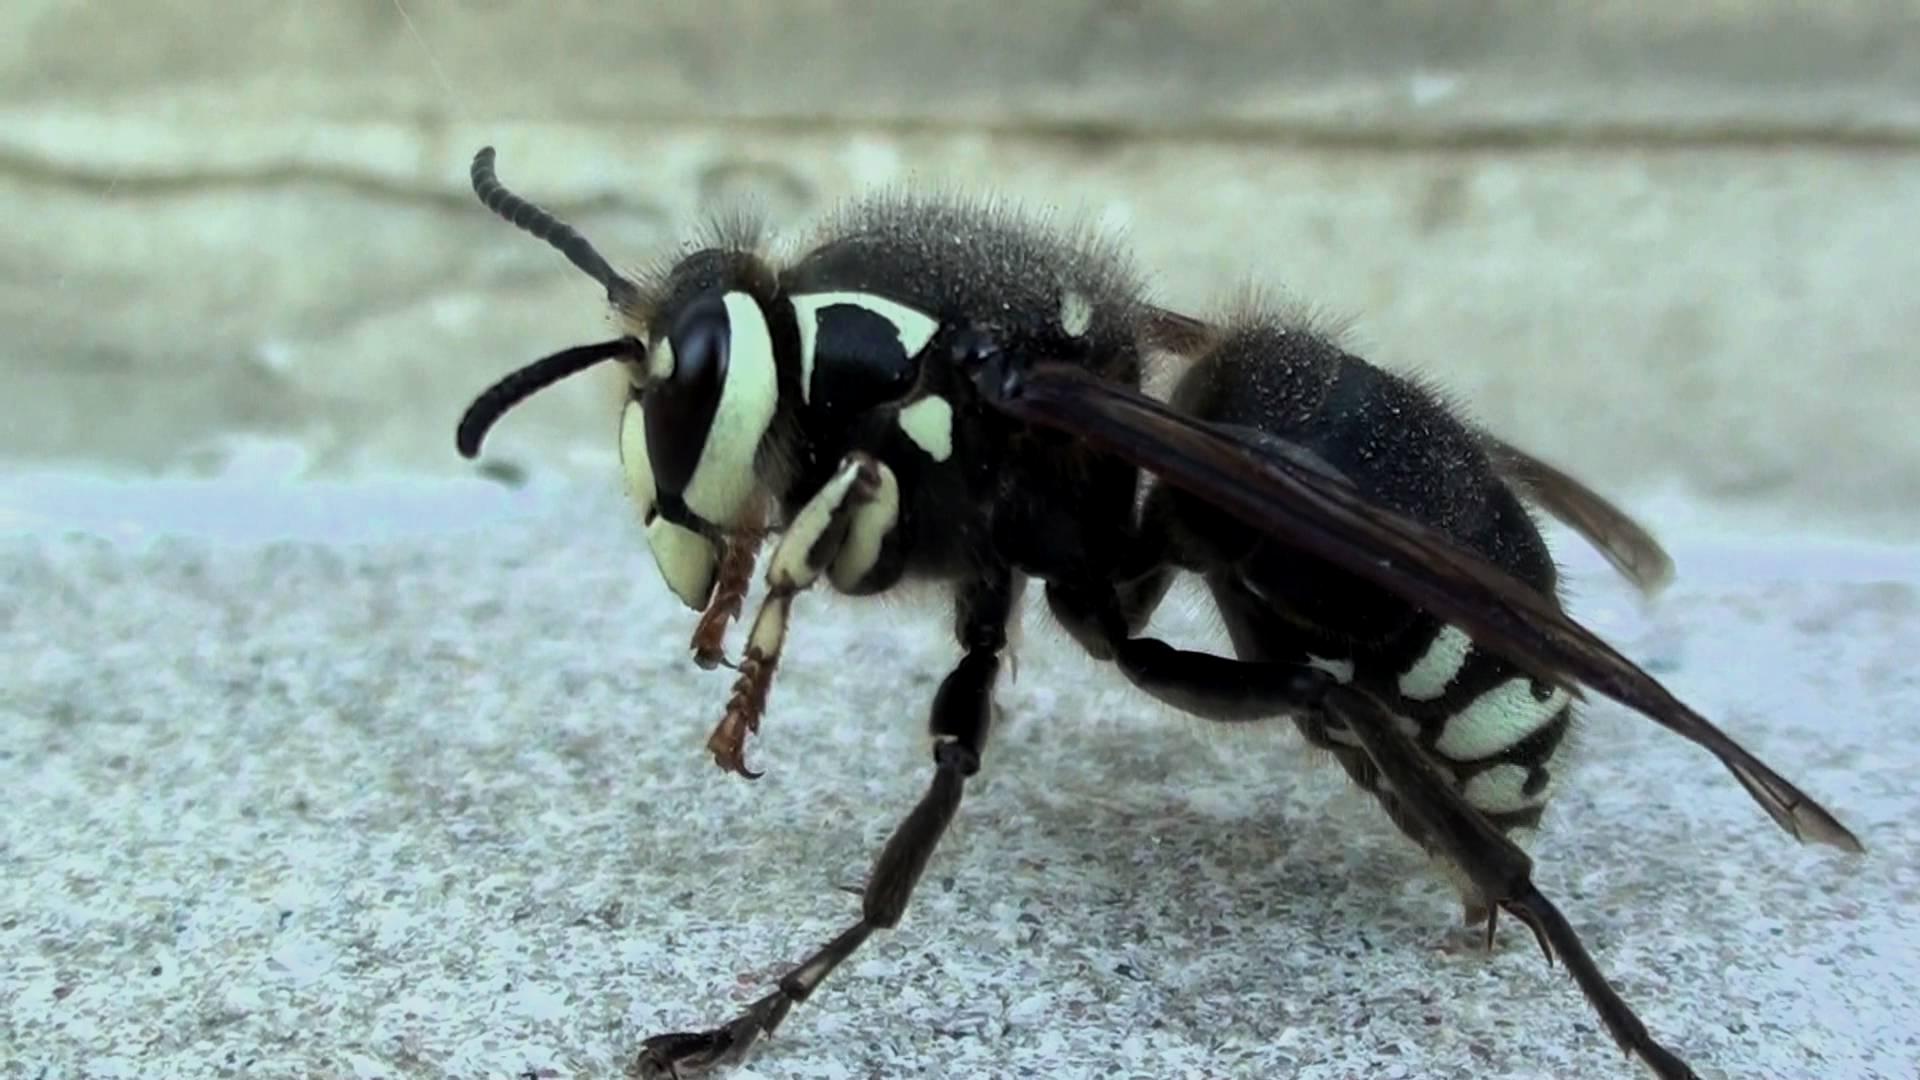 Bald Faced Hornet Close Up Shot  Japanese Giant Hornet Sting Wound    Japanese Giant Hornet Sting Wound